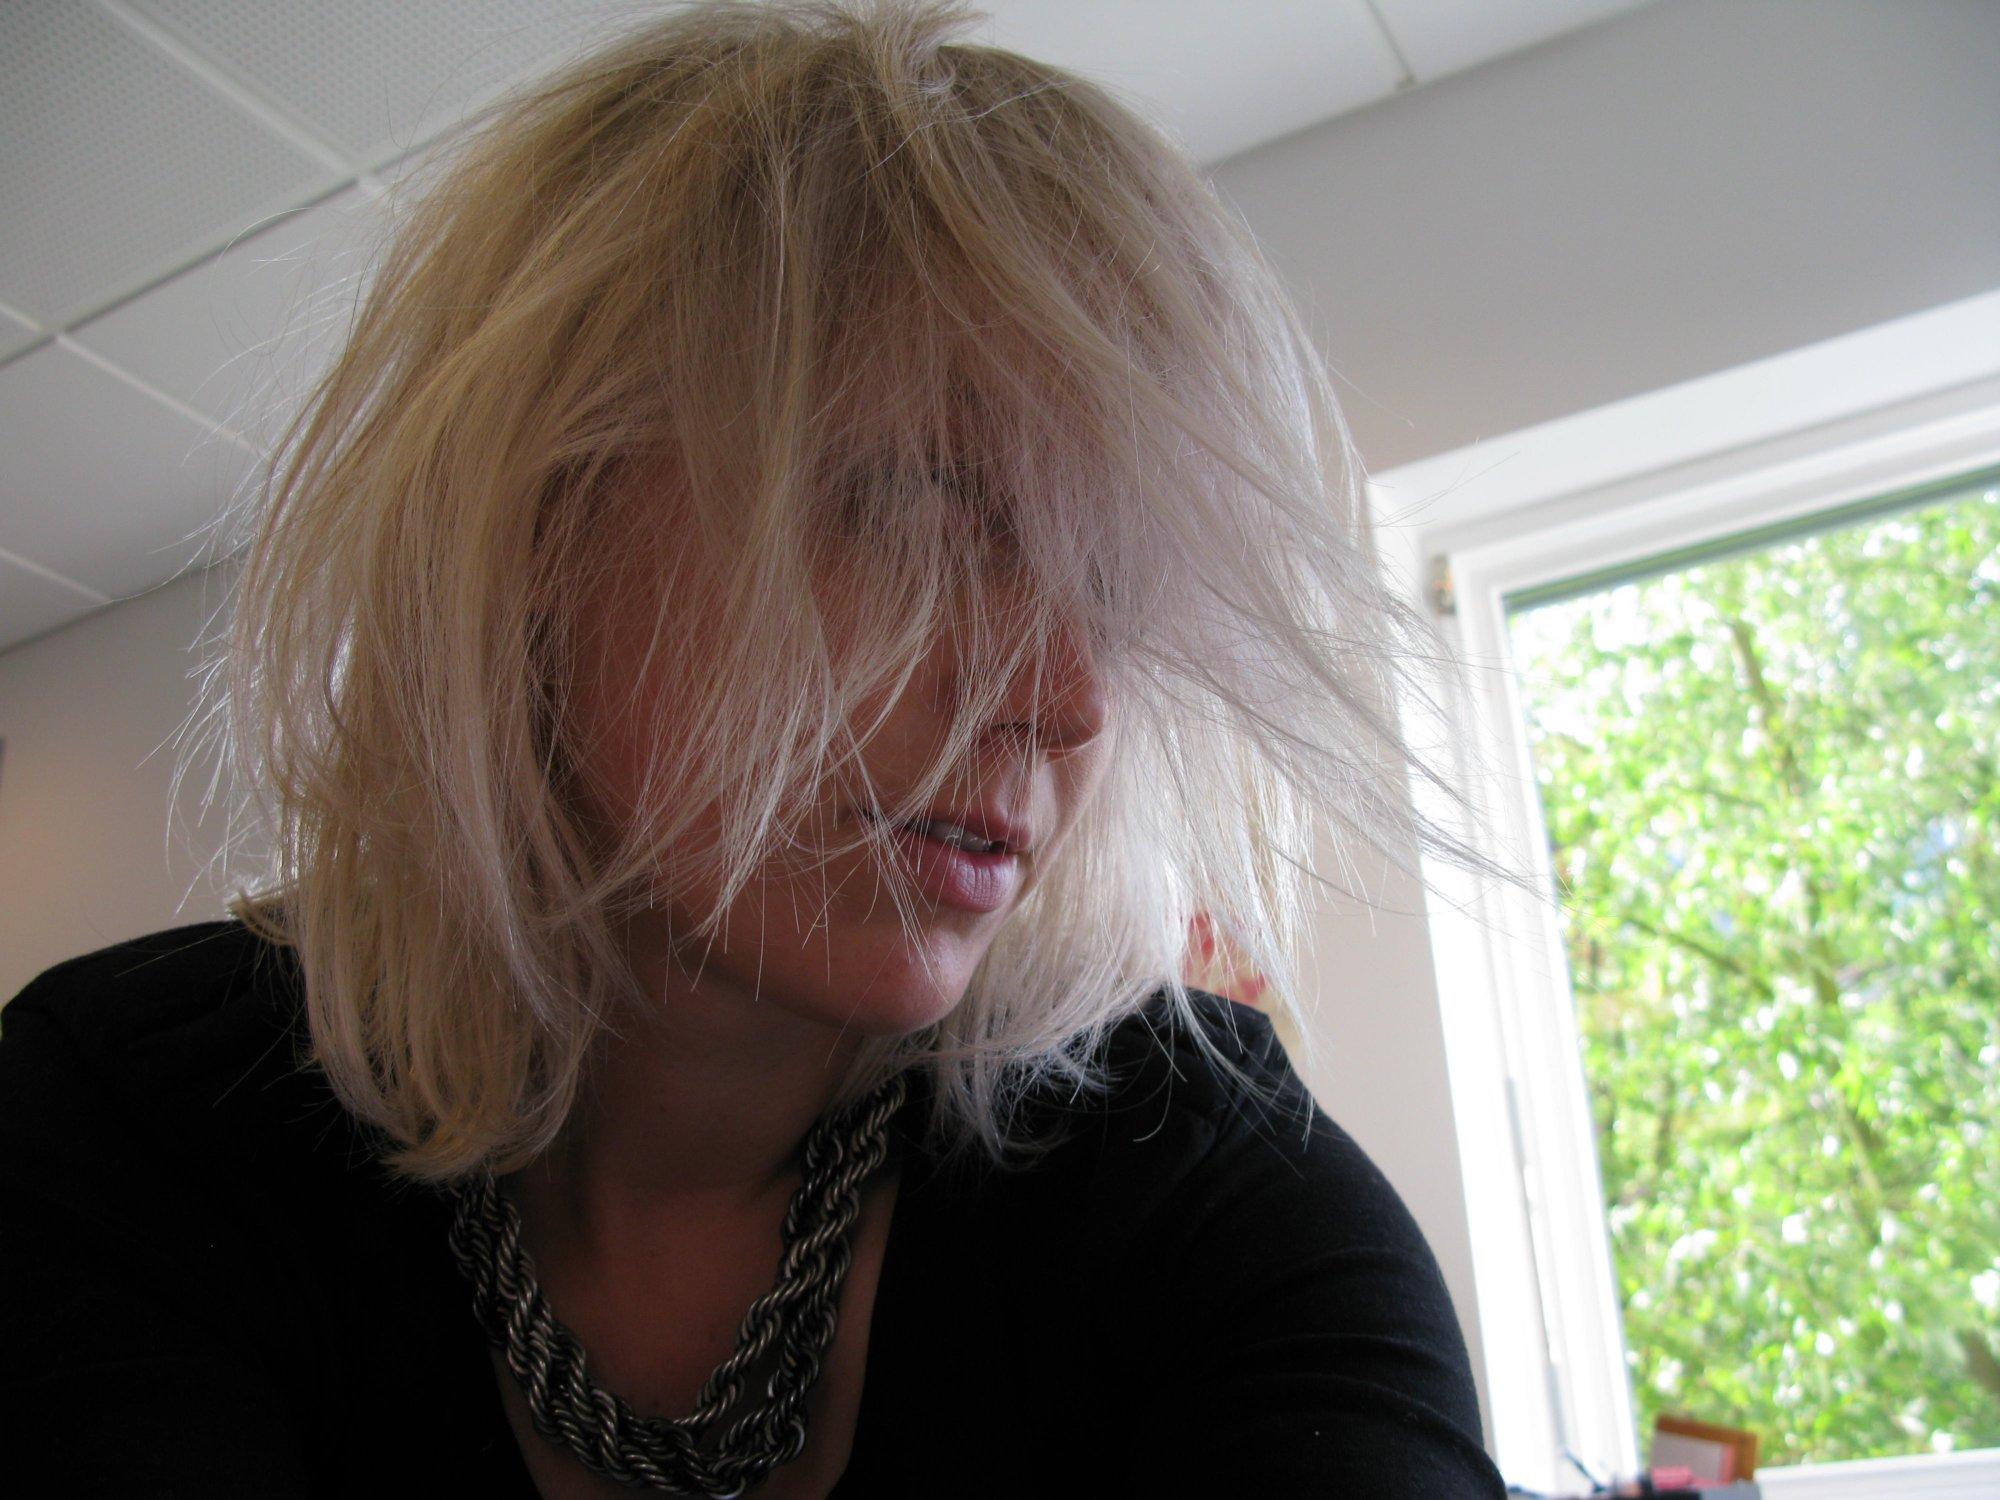 Fluffy hår, på den gode måde